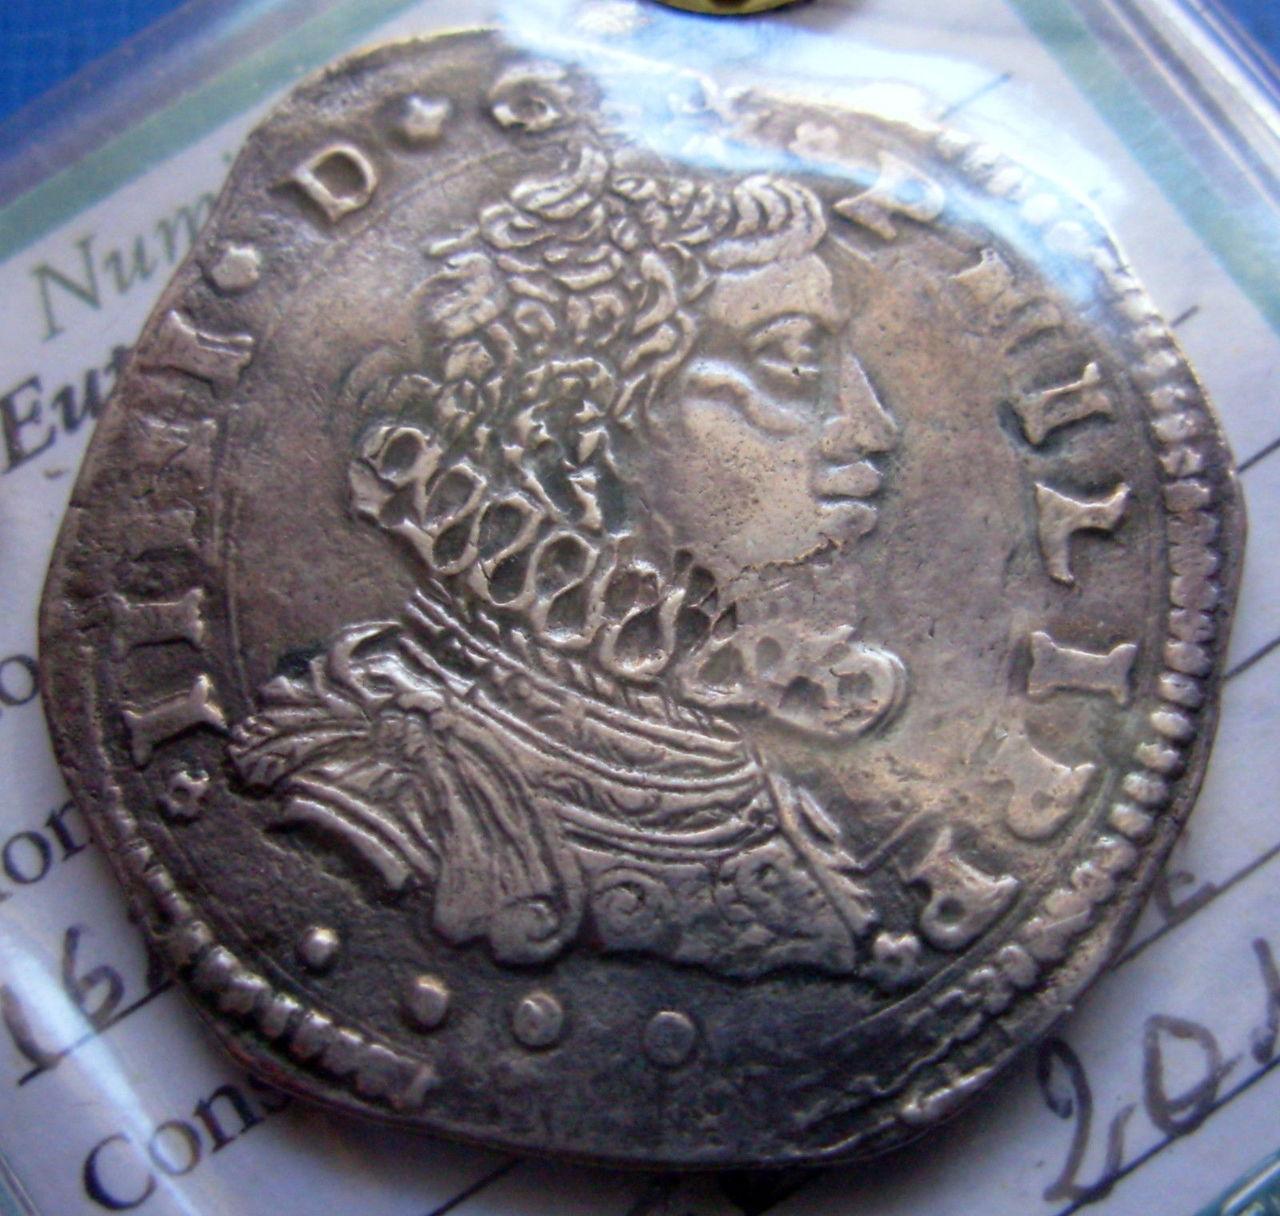 4 Tari de Felipe IV, Messina (Sicilia) 1626- Dedicada a Jotasoler- De su rey favorito o no...... Felipe_IV_anv